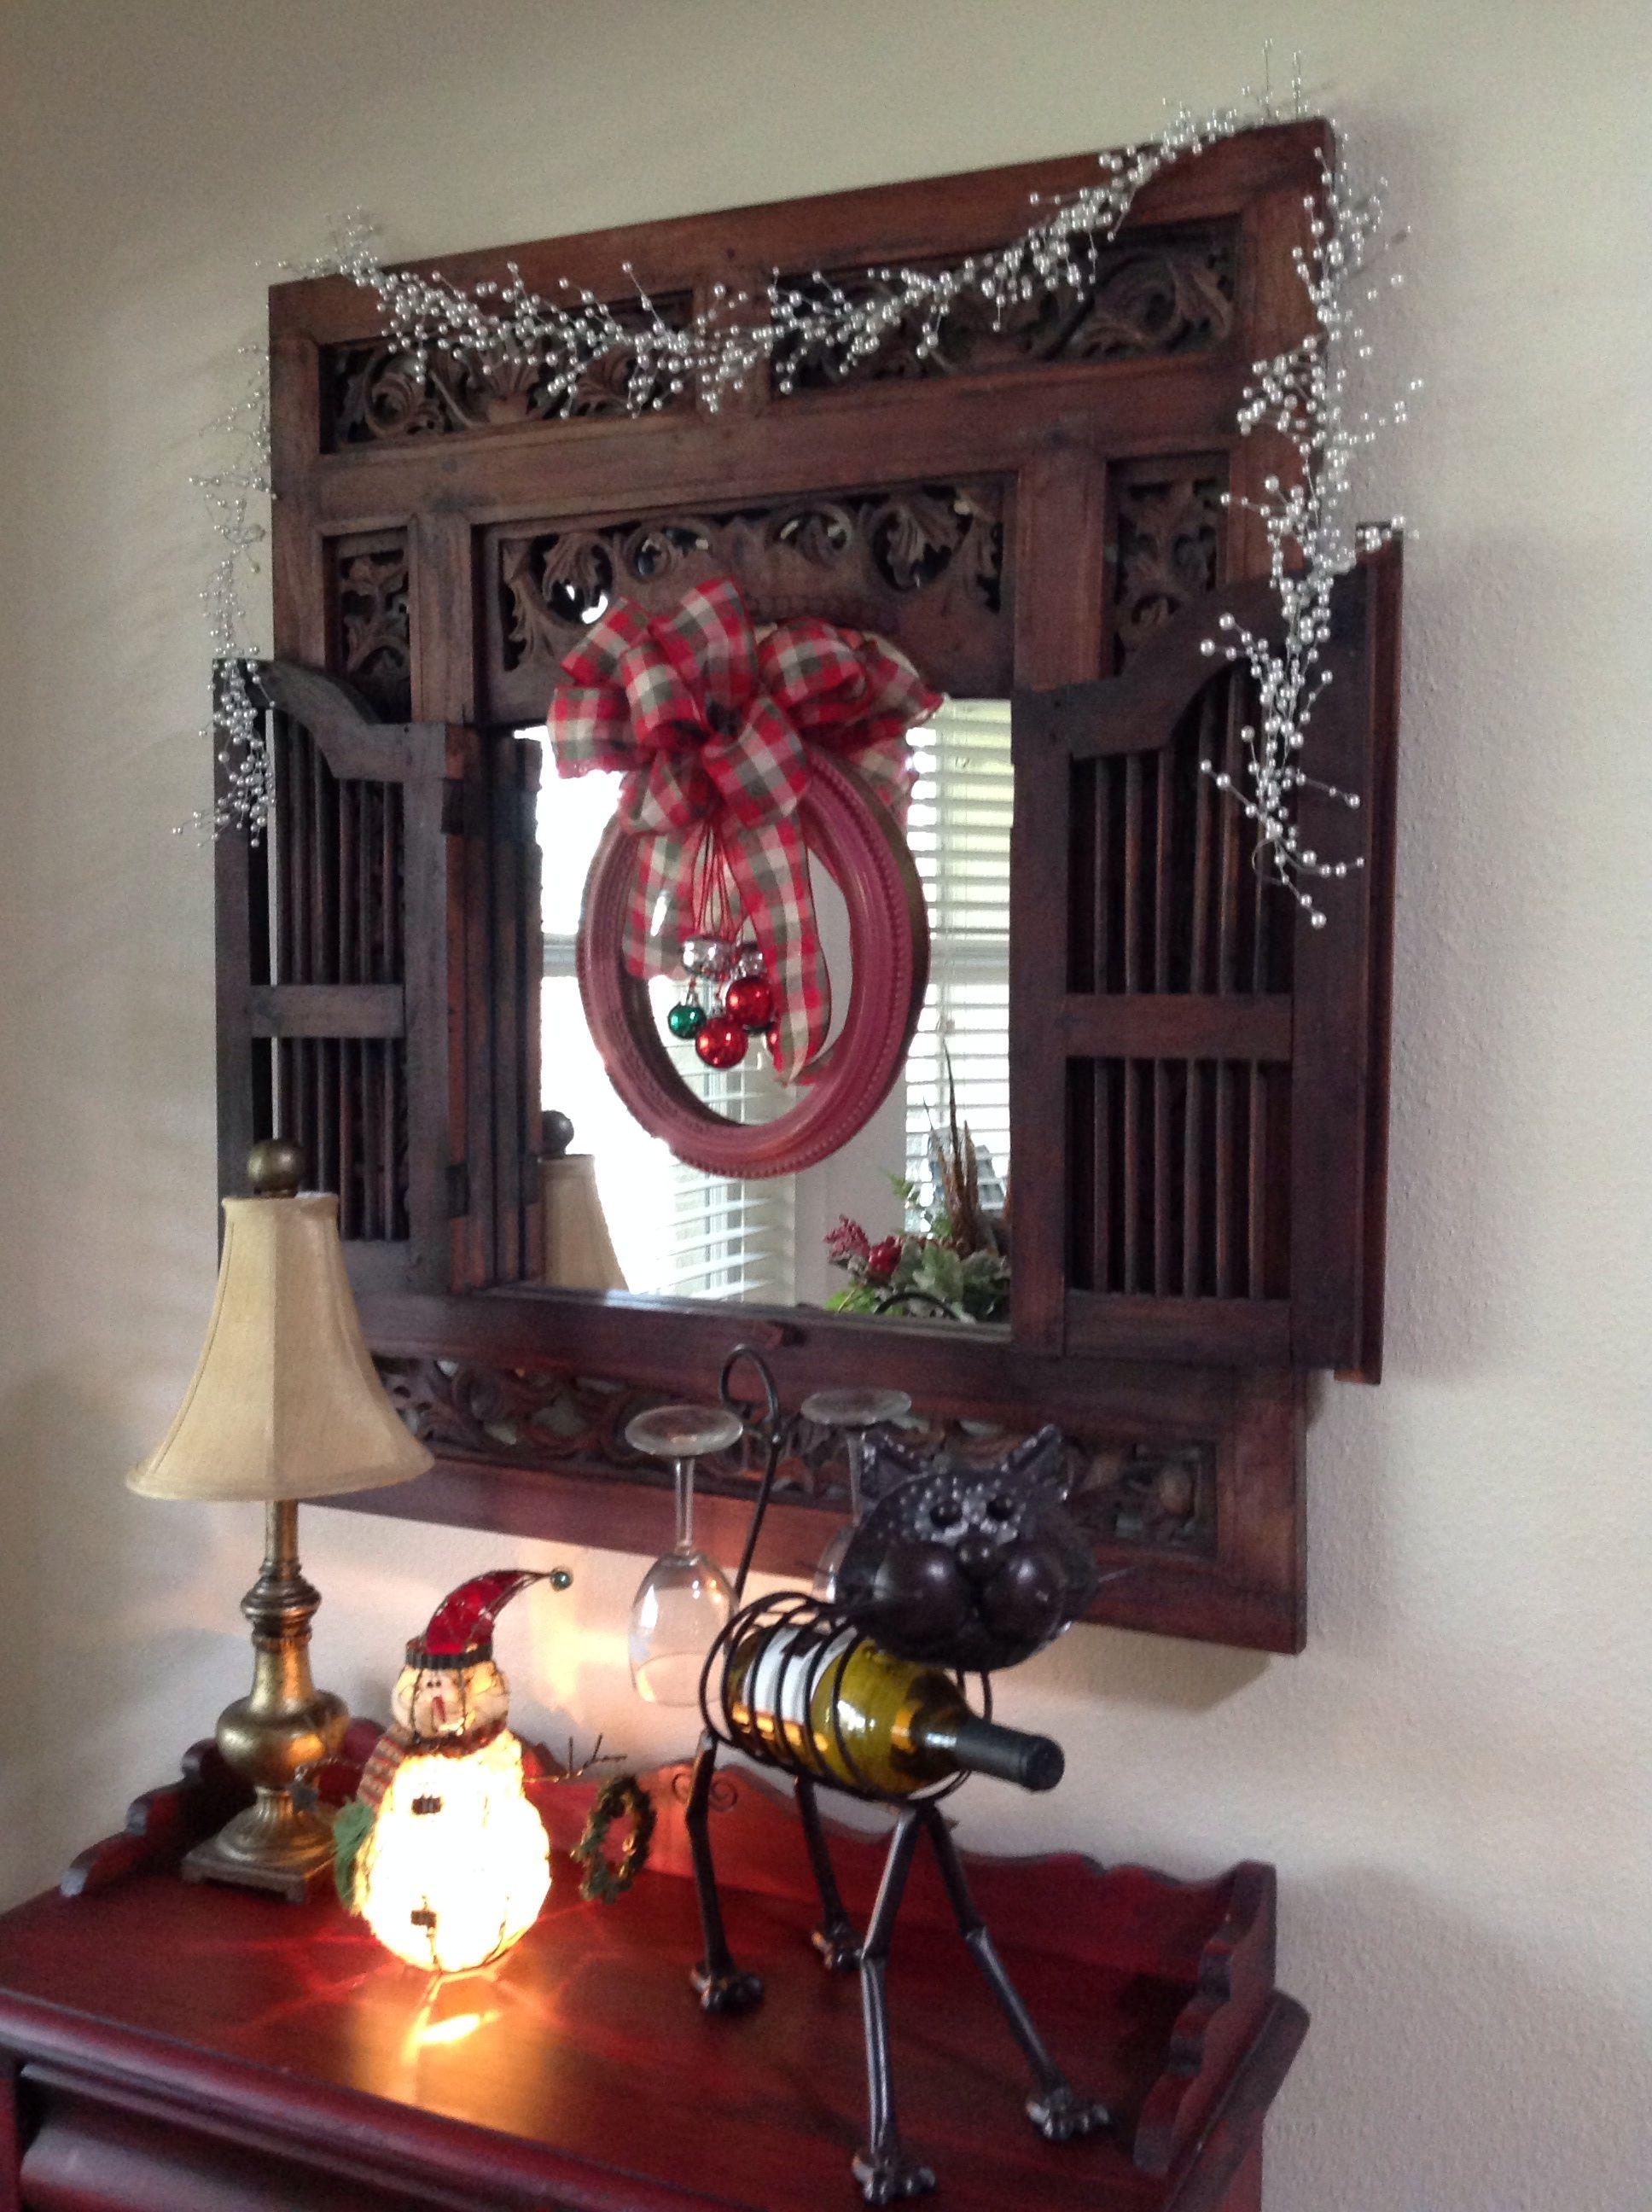 Vintage frame wreath - got the idea from Pinterest.